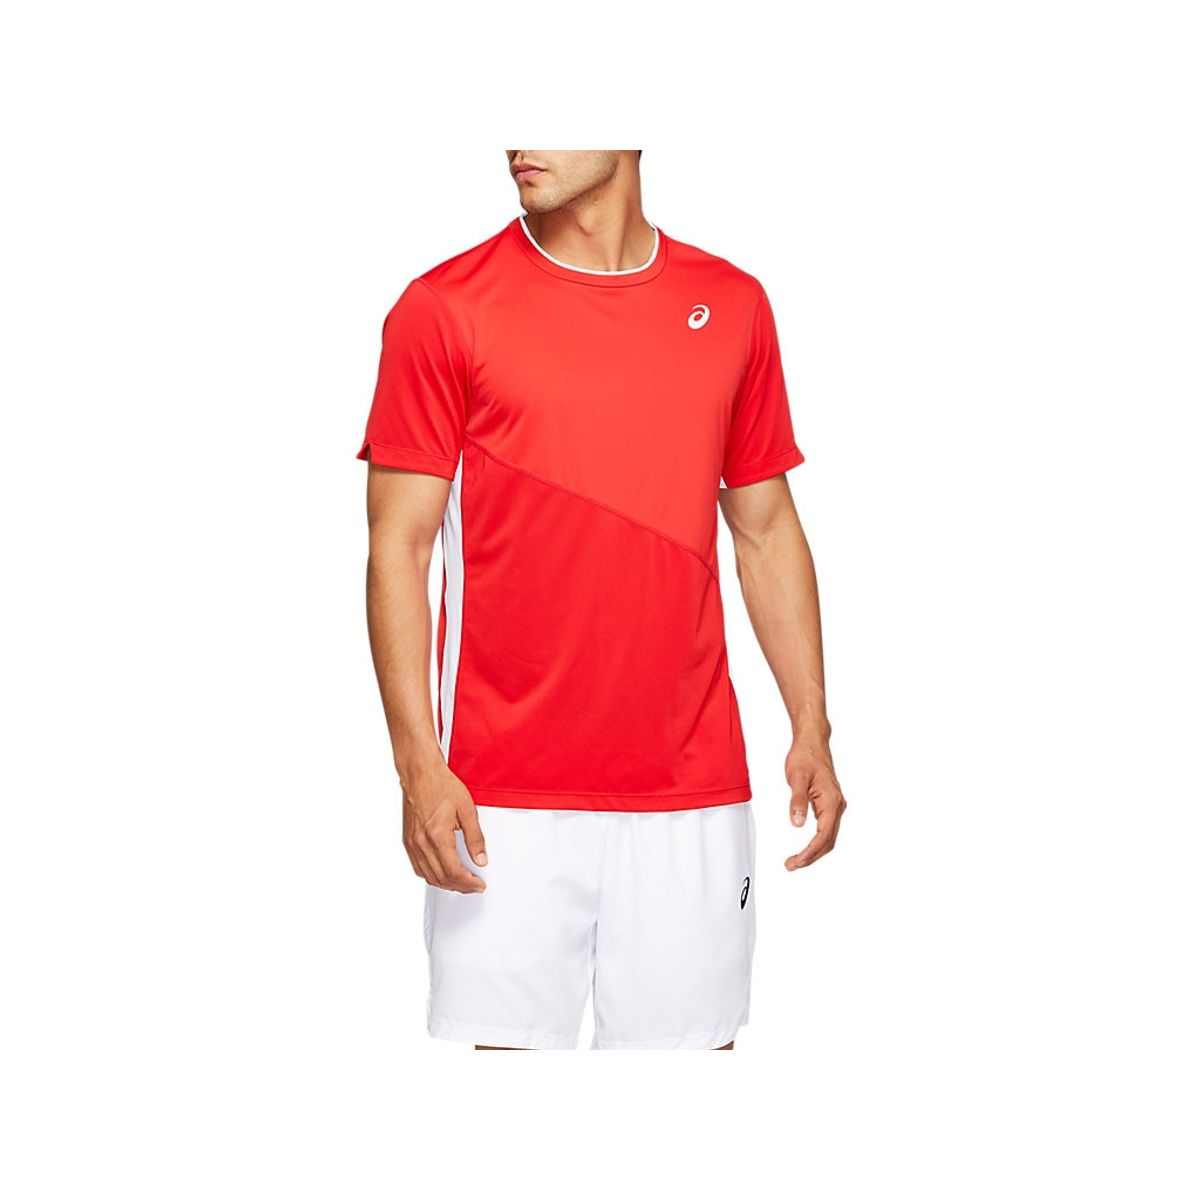 Camiseta-ASICS-Club---Vermelho---Masculino